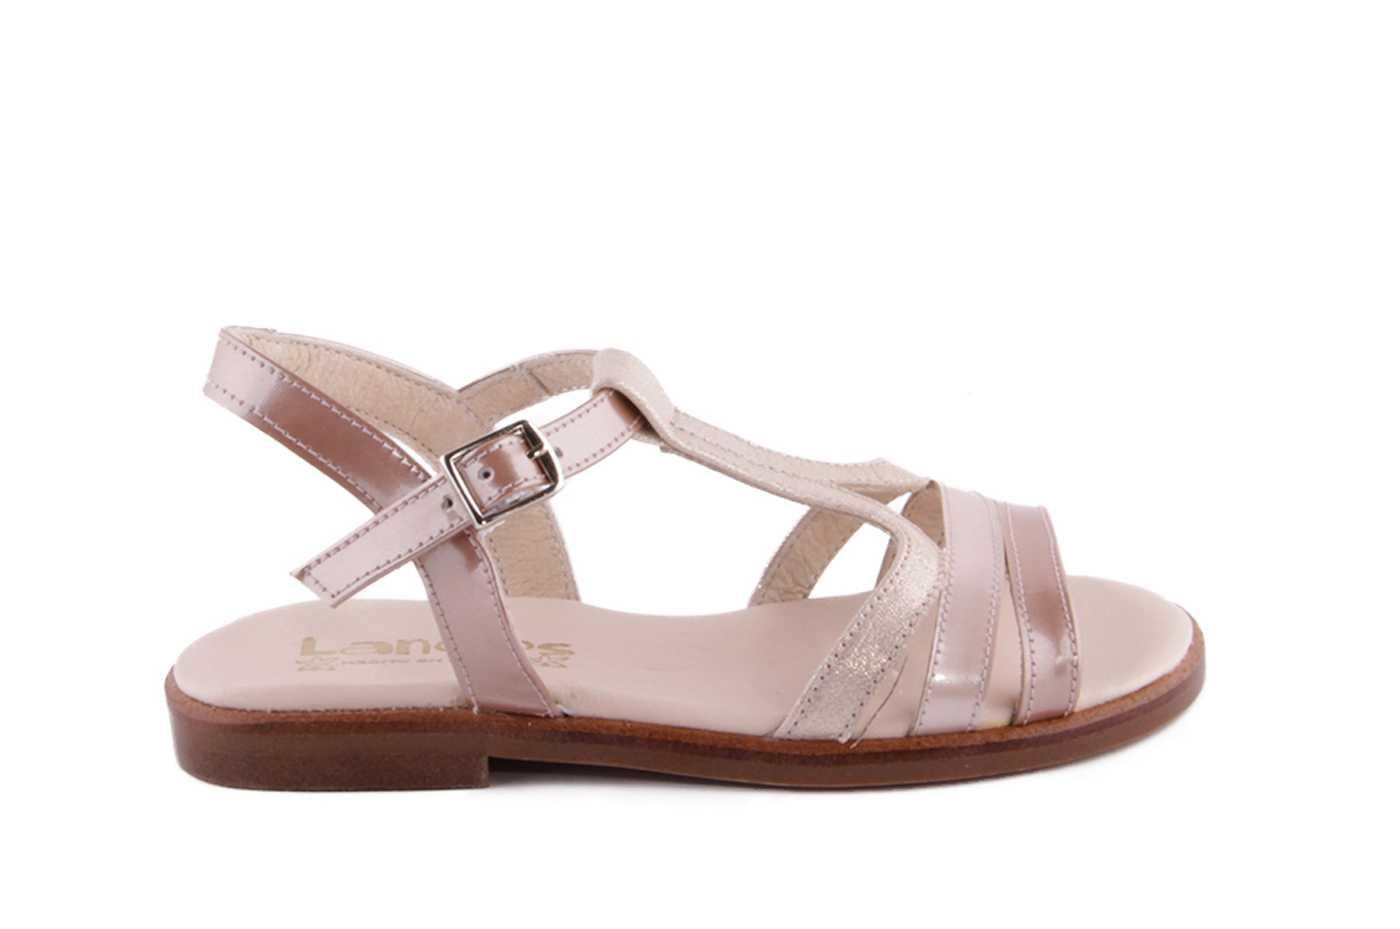 bfe3049b3 Comprar zapato tipo JOVEN NIÑA estilo SANDALIA COLOR ROSA CHAROL ...